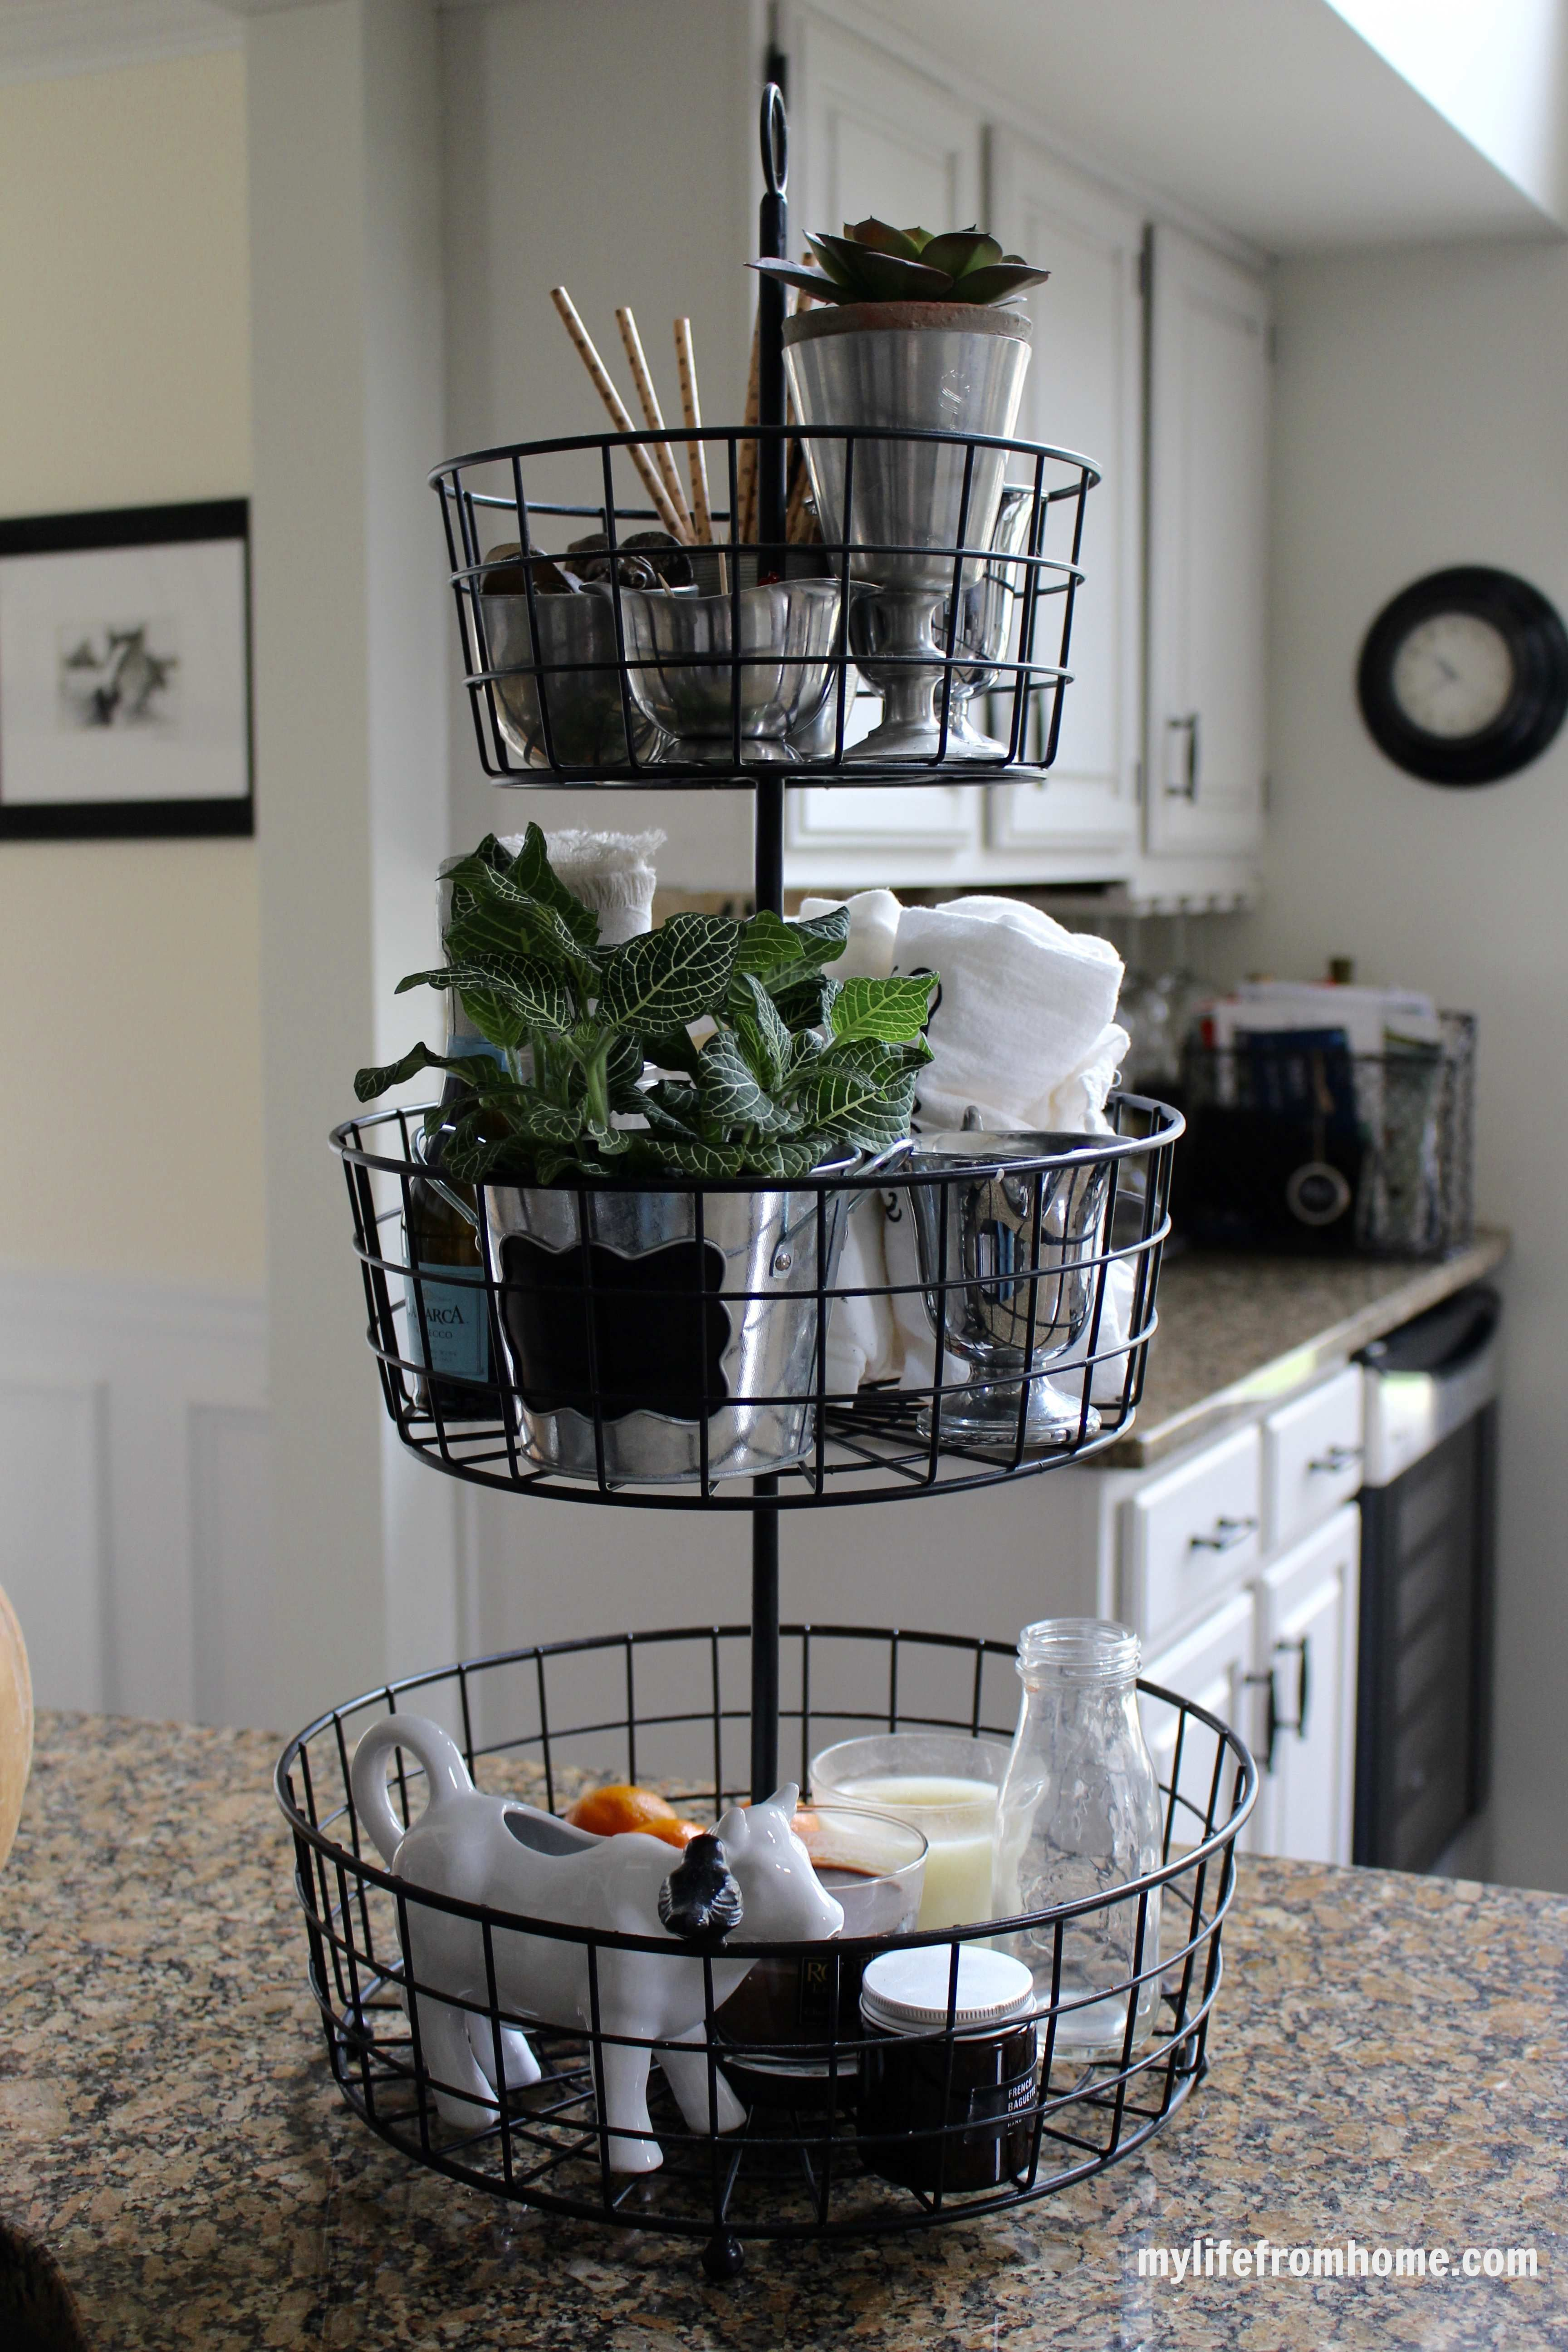 Wire Racks For Kitchen Storage Kitchen Storage Ideas 3 Tier Wire Rack My Life From Home Www